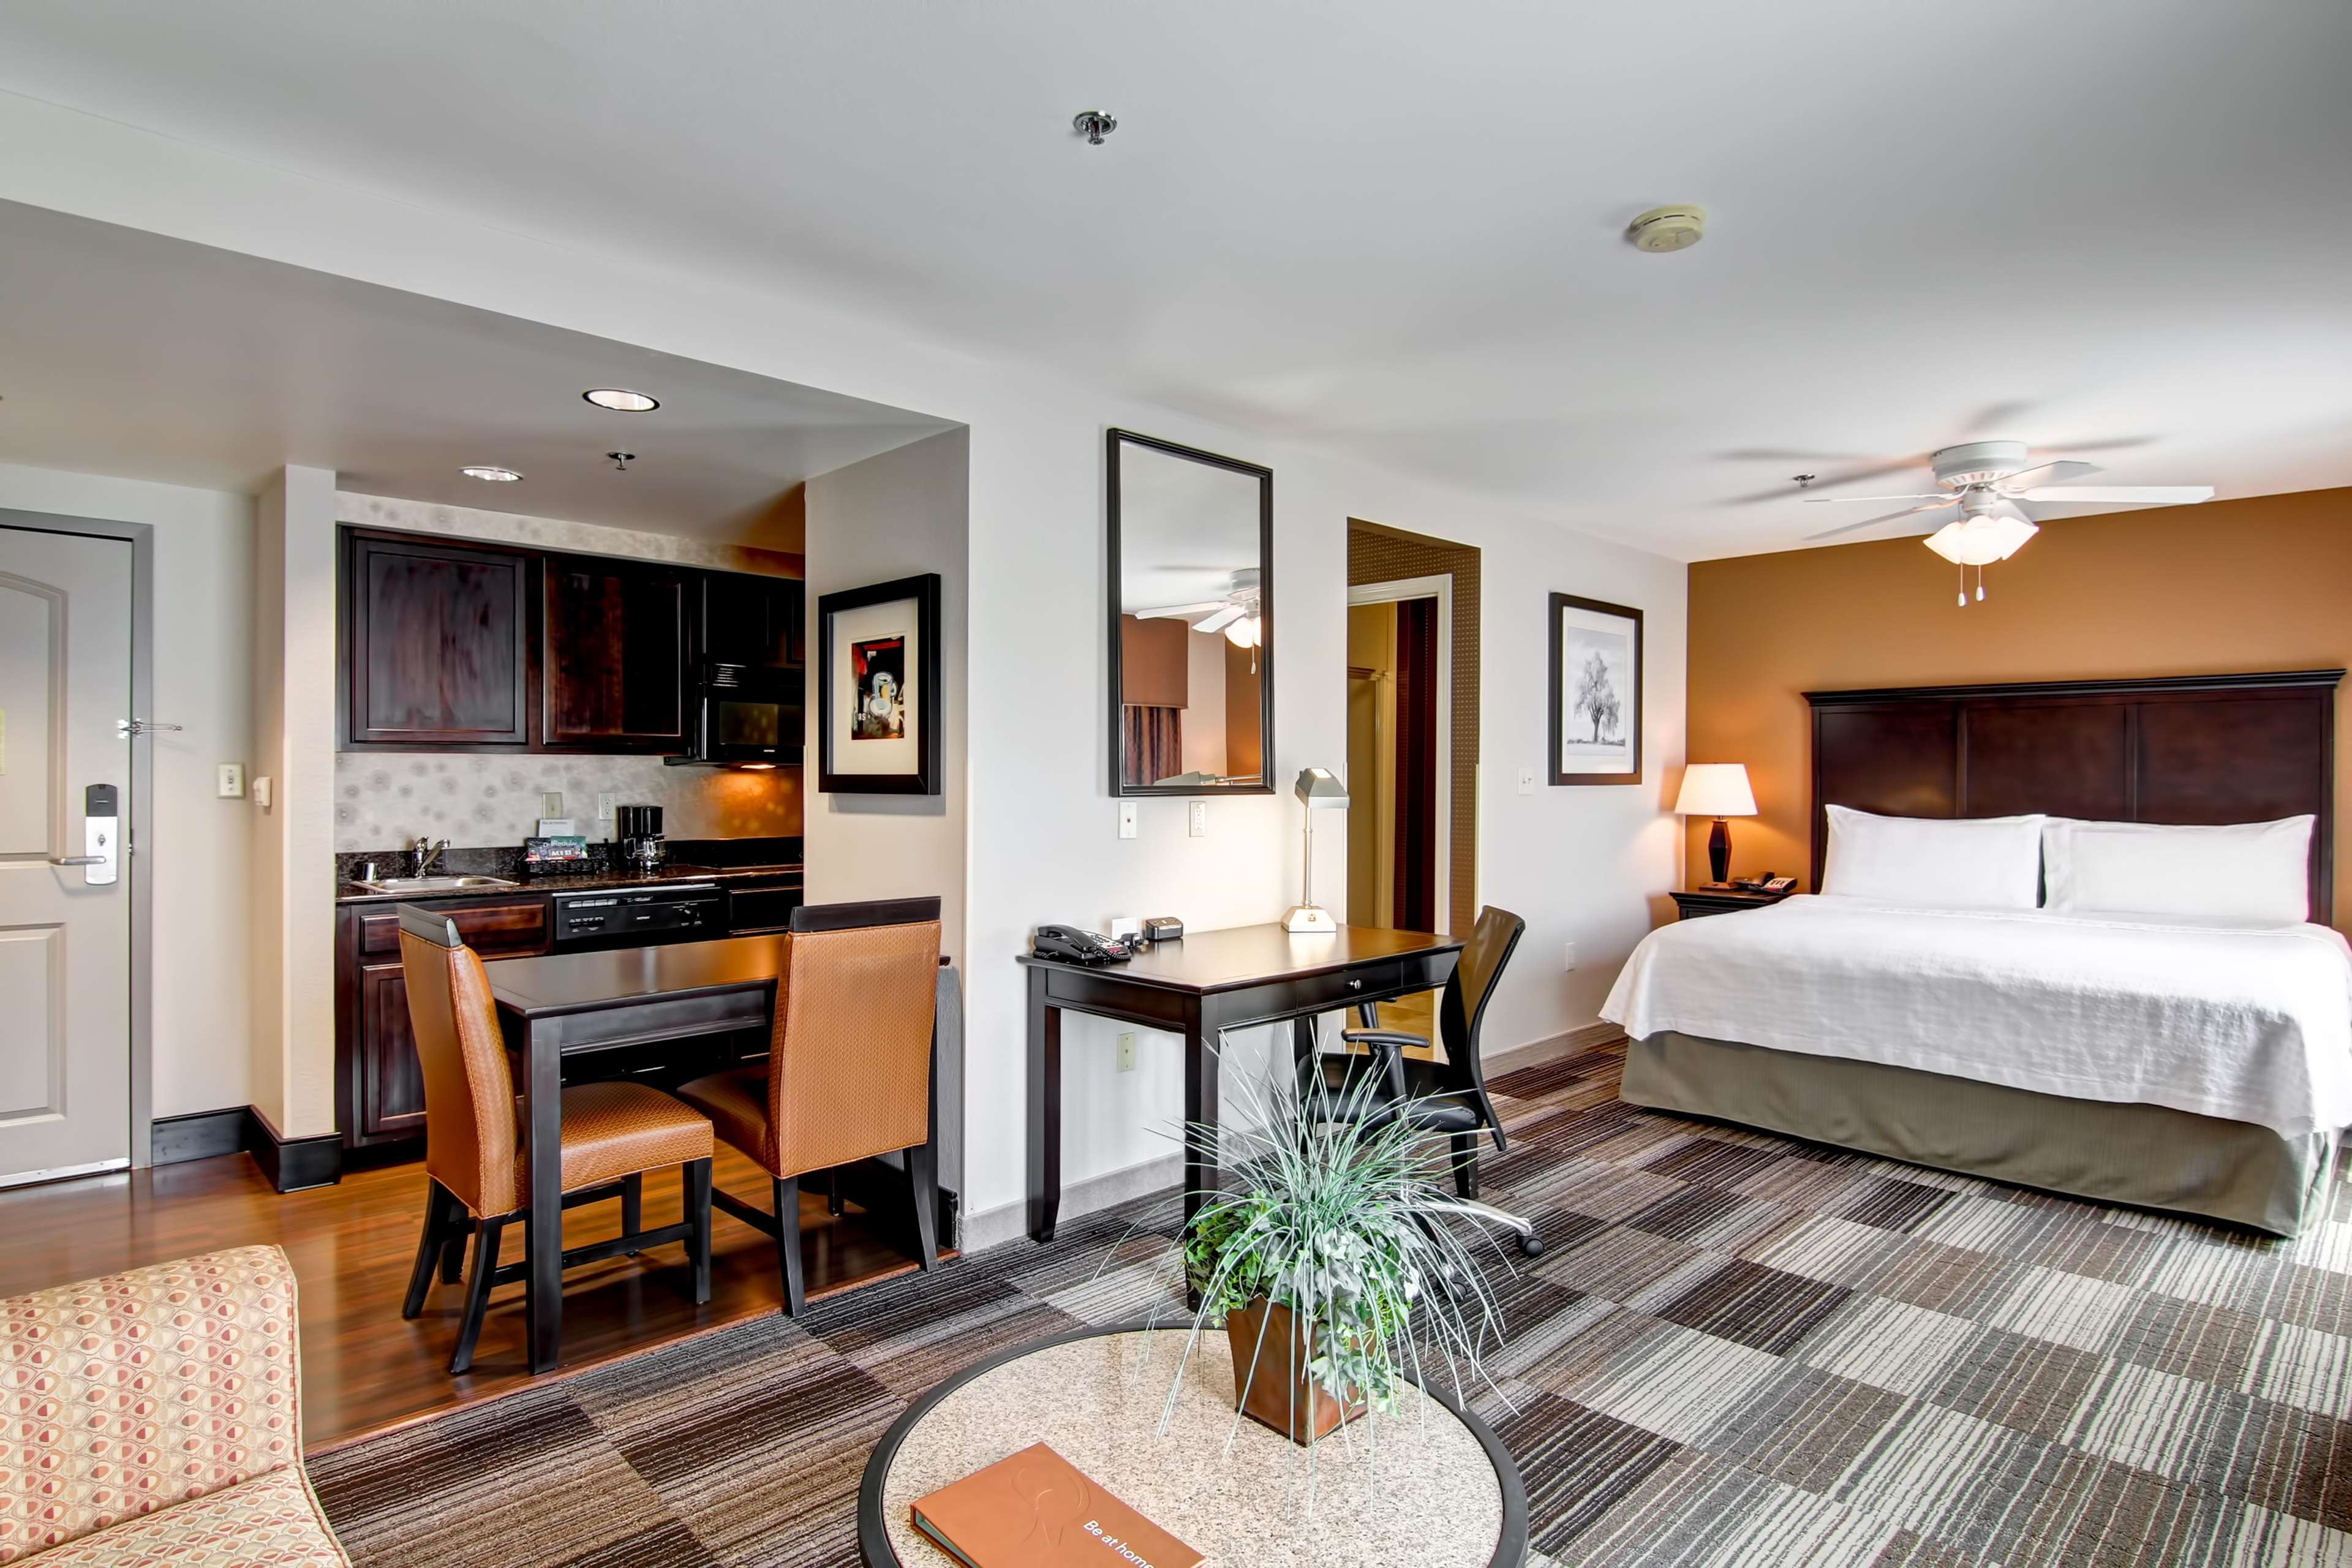 Homewood Suites by Hilton Cincinnati Airport South-Florence image 33